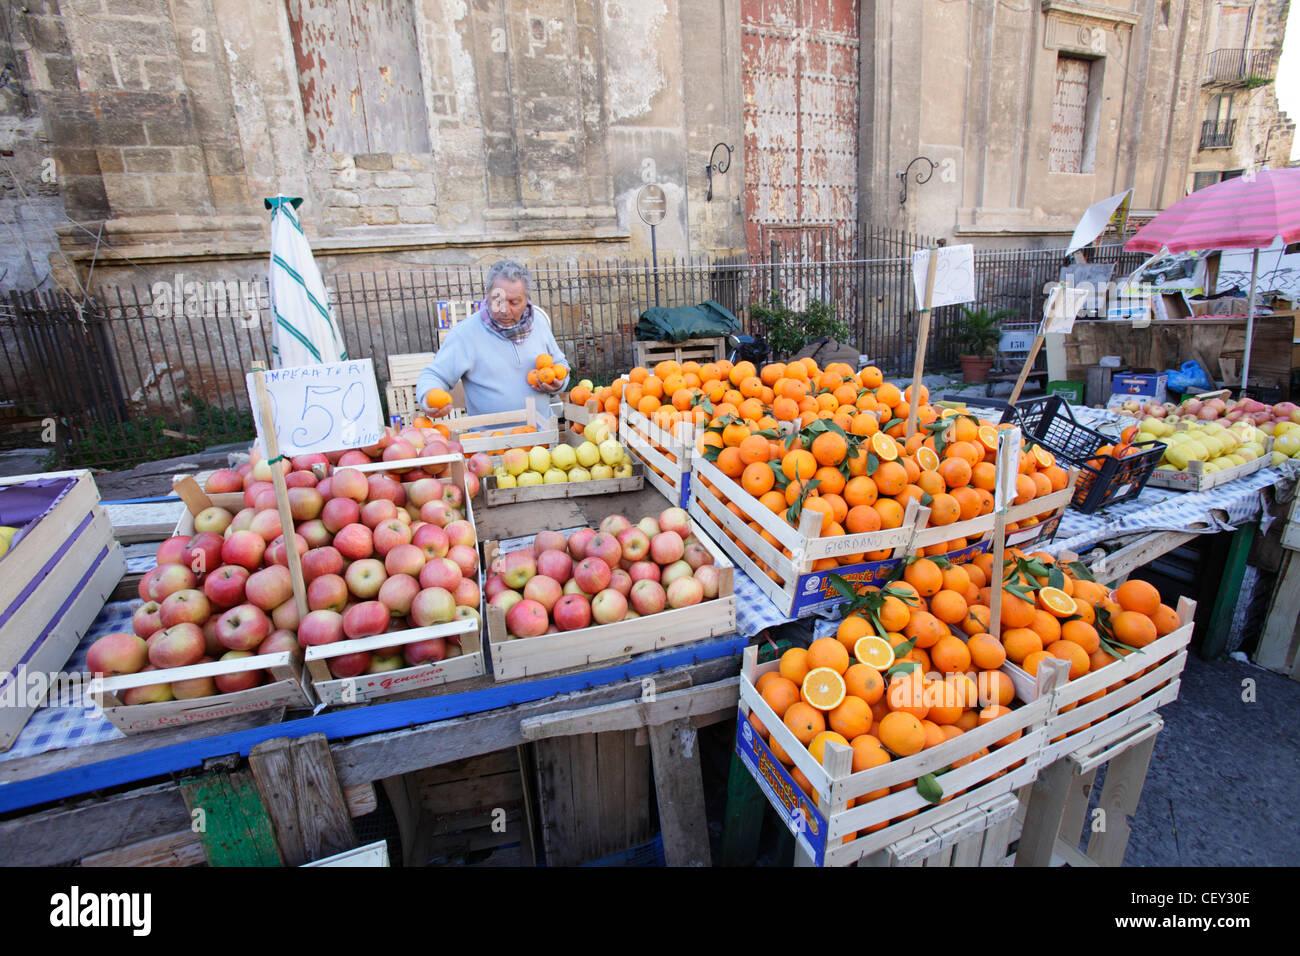 Traditional Ballarò market, Palermo, Italy - Stock Image